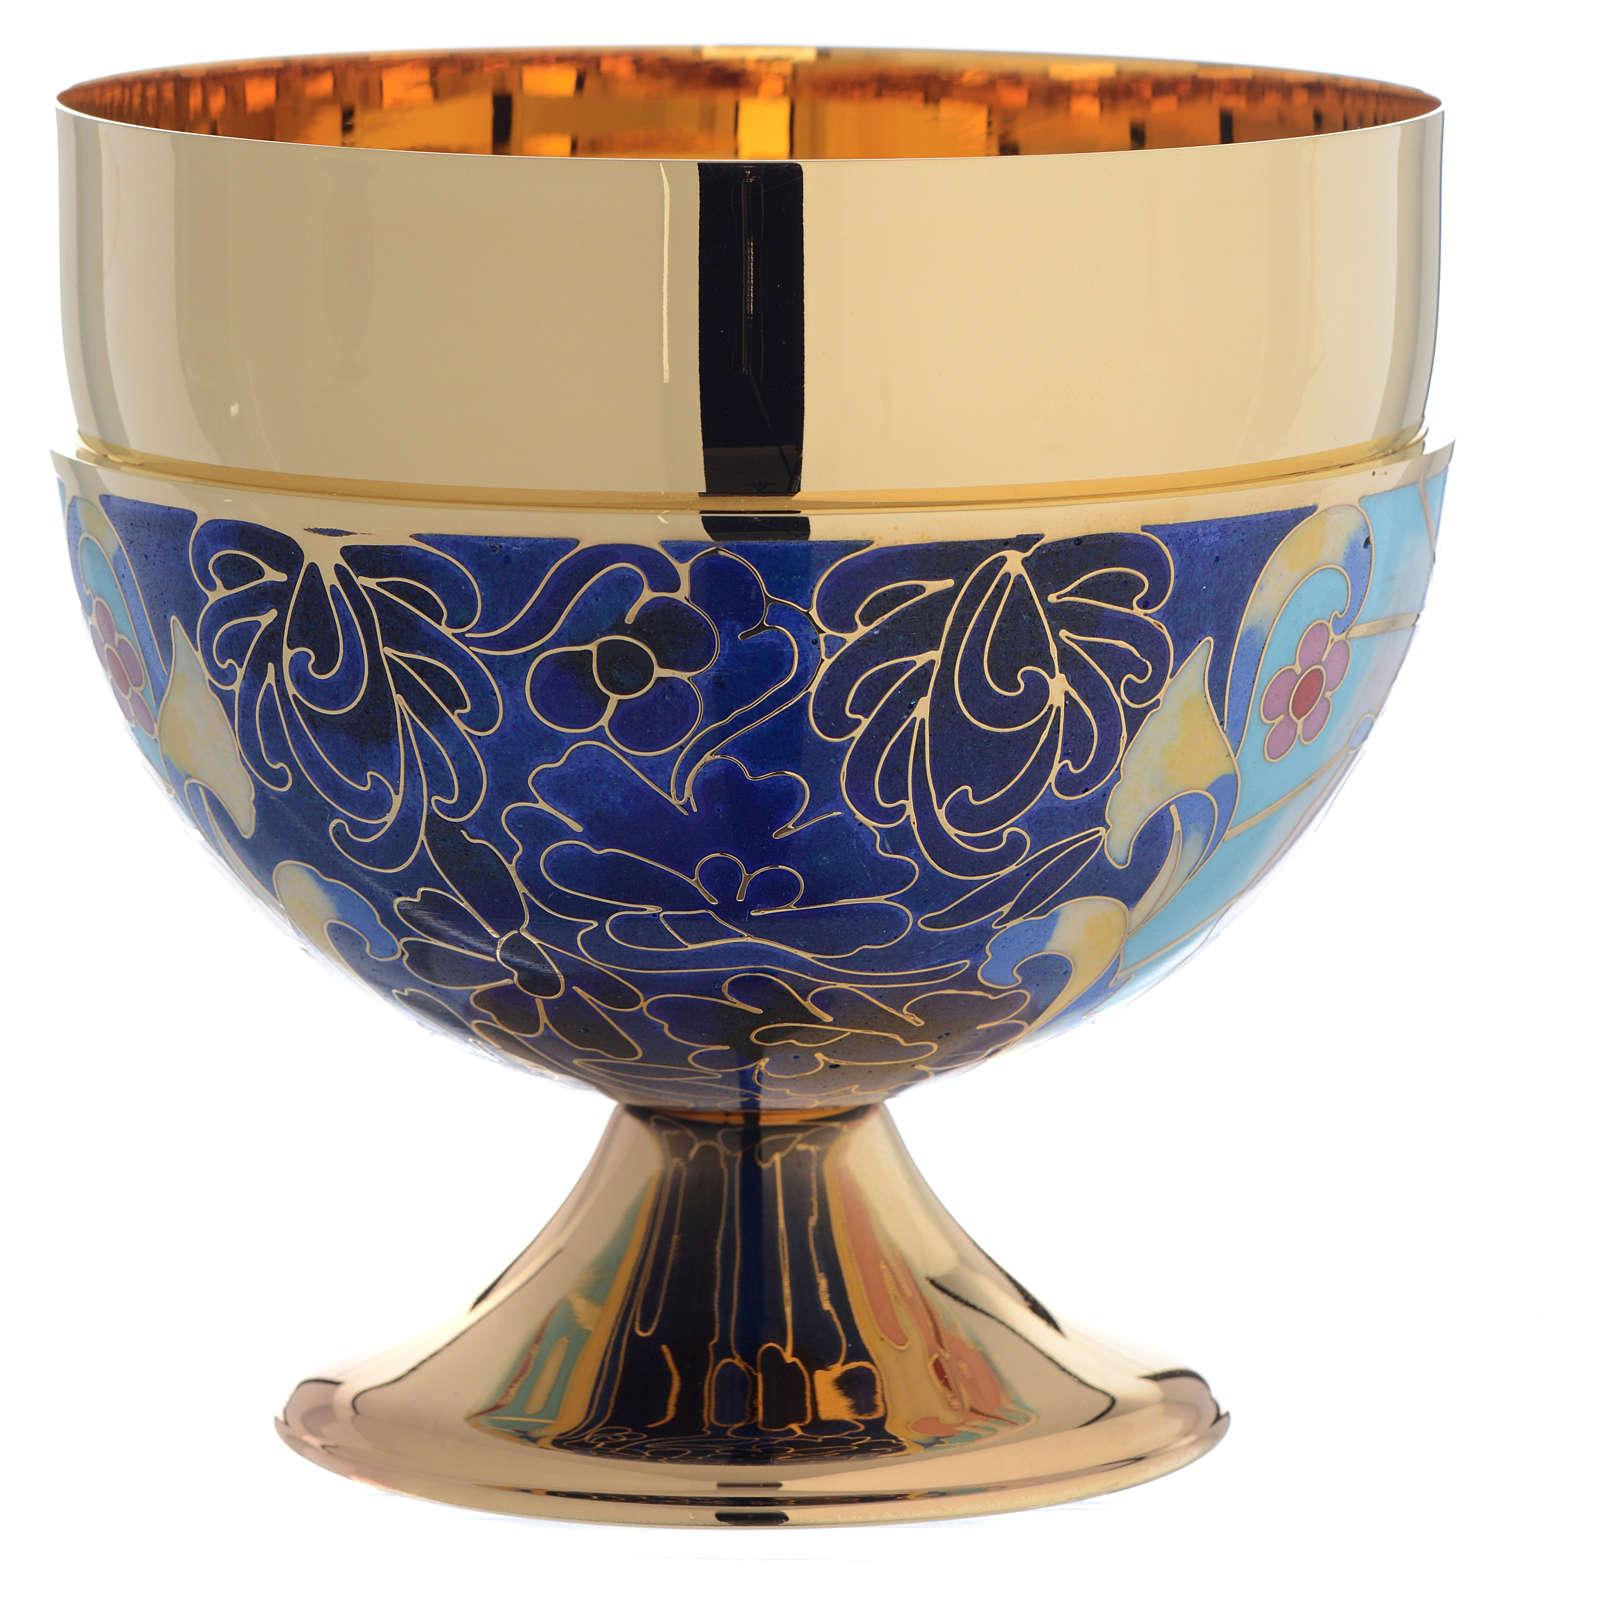 Bowl paten Agnus Dei and IHS symbol, brass and enamel 4